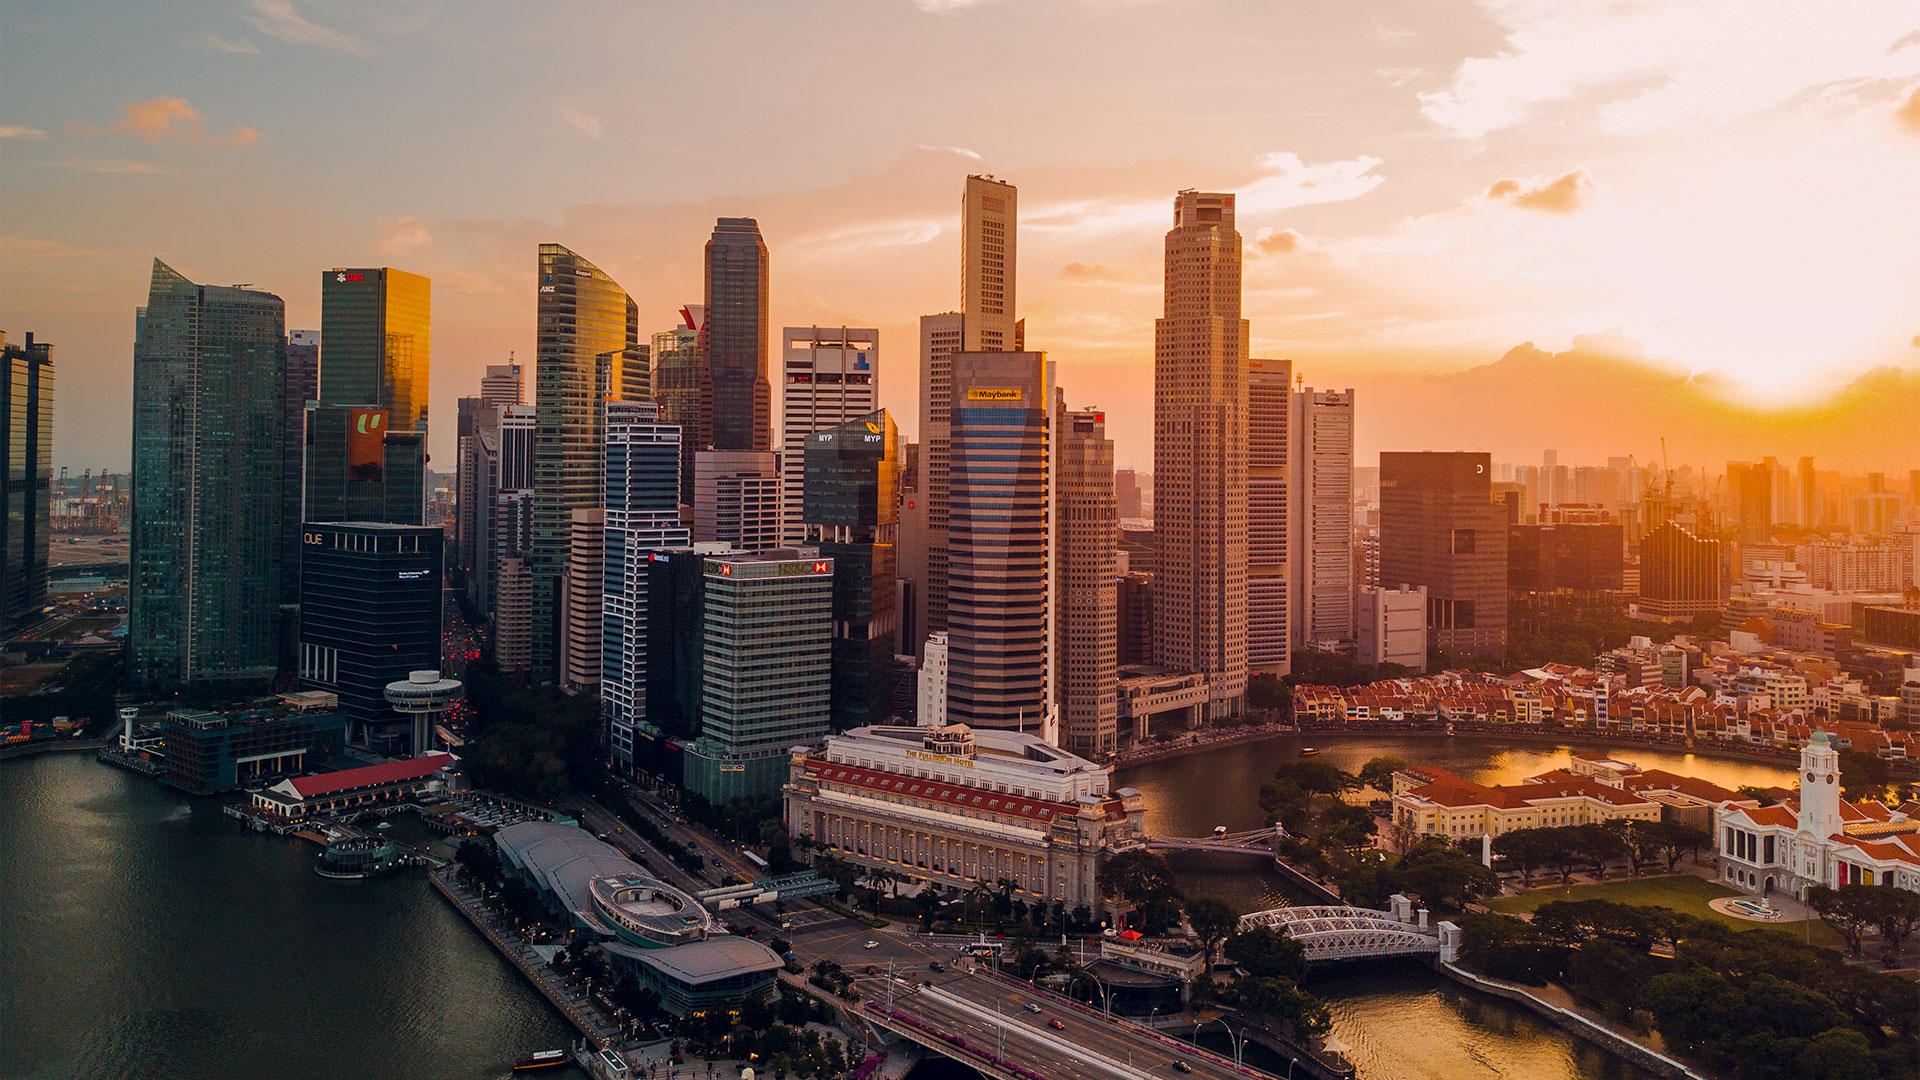 The Helmi Talib Group Singapore